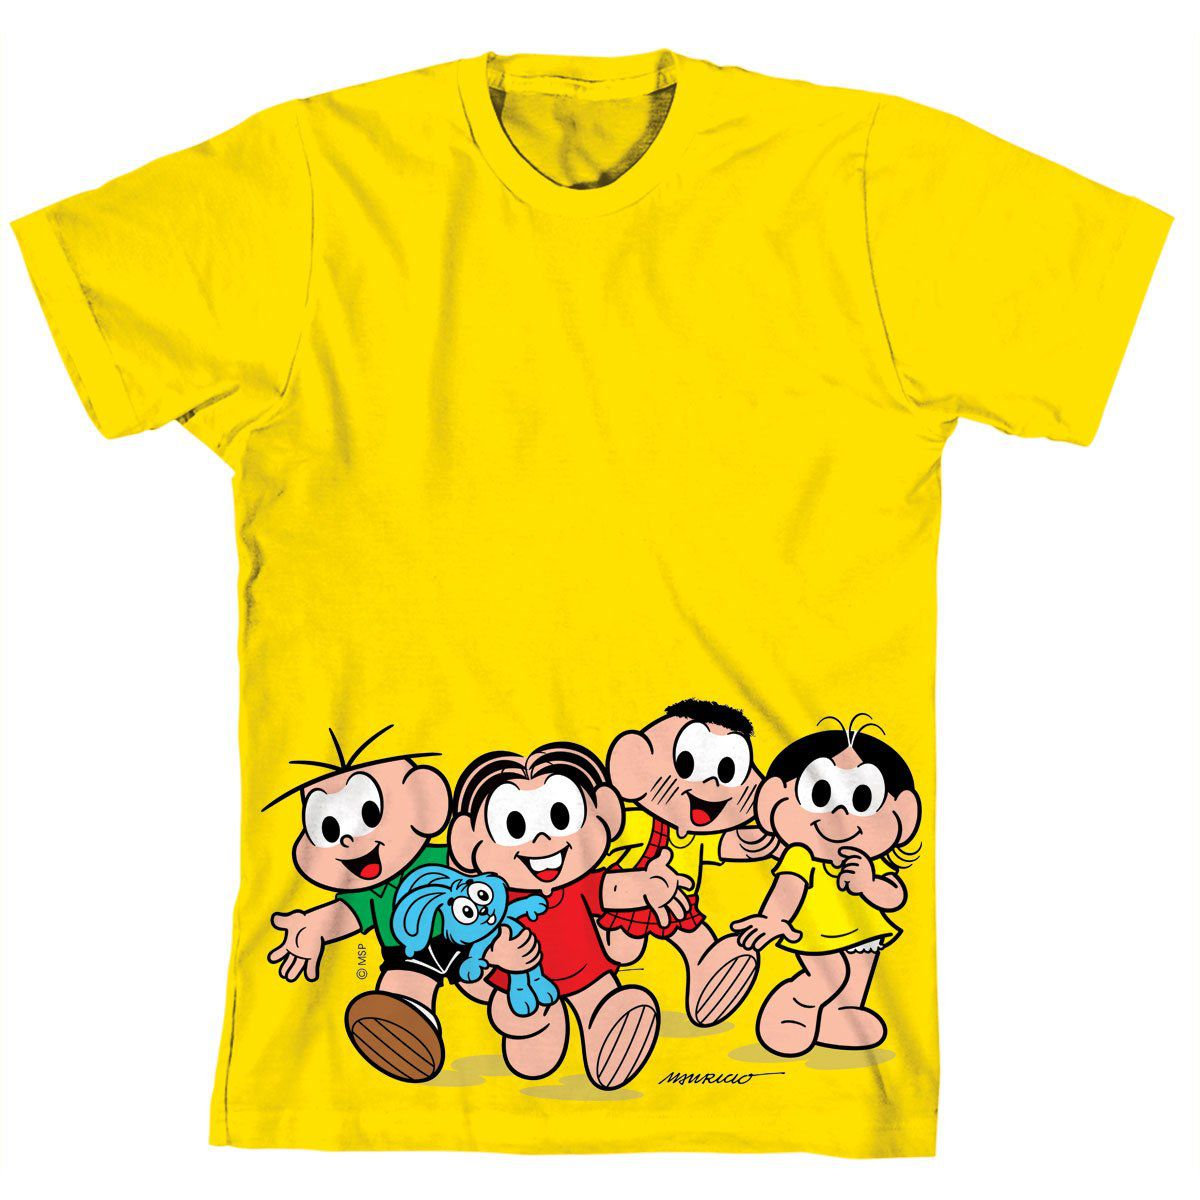 Camiseta Infantil Turma da Mônica Kids A Turma Modelo 2  - bandUP Store Marketplace